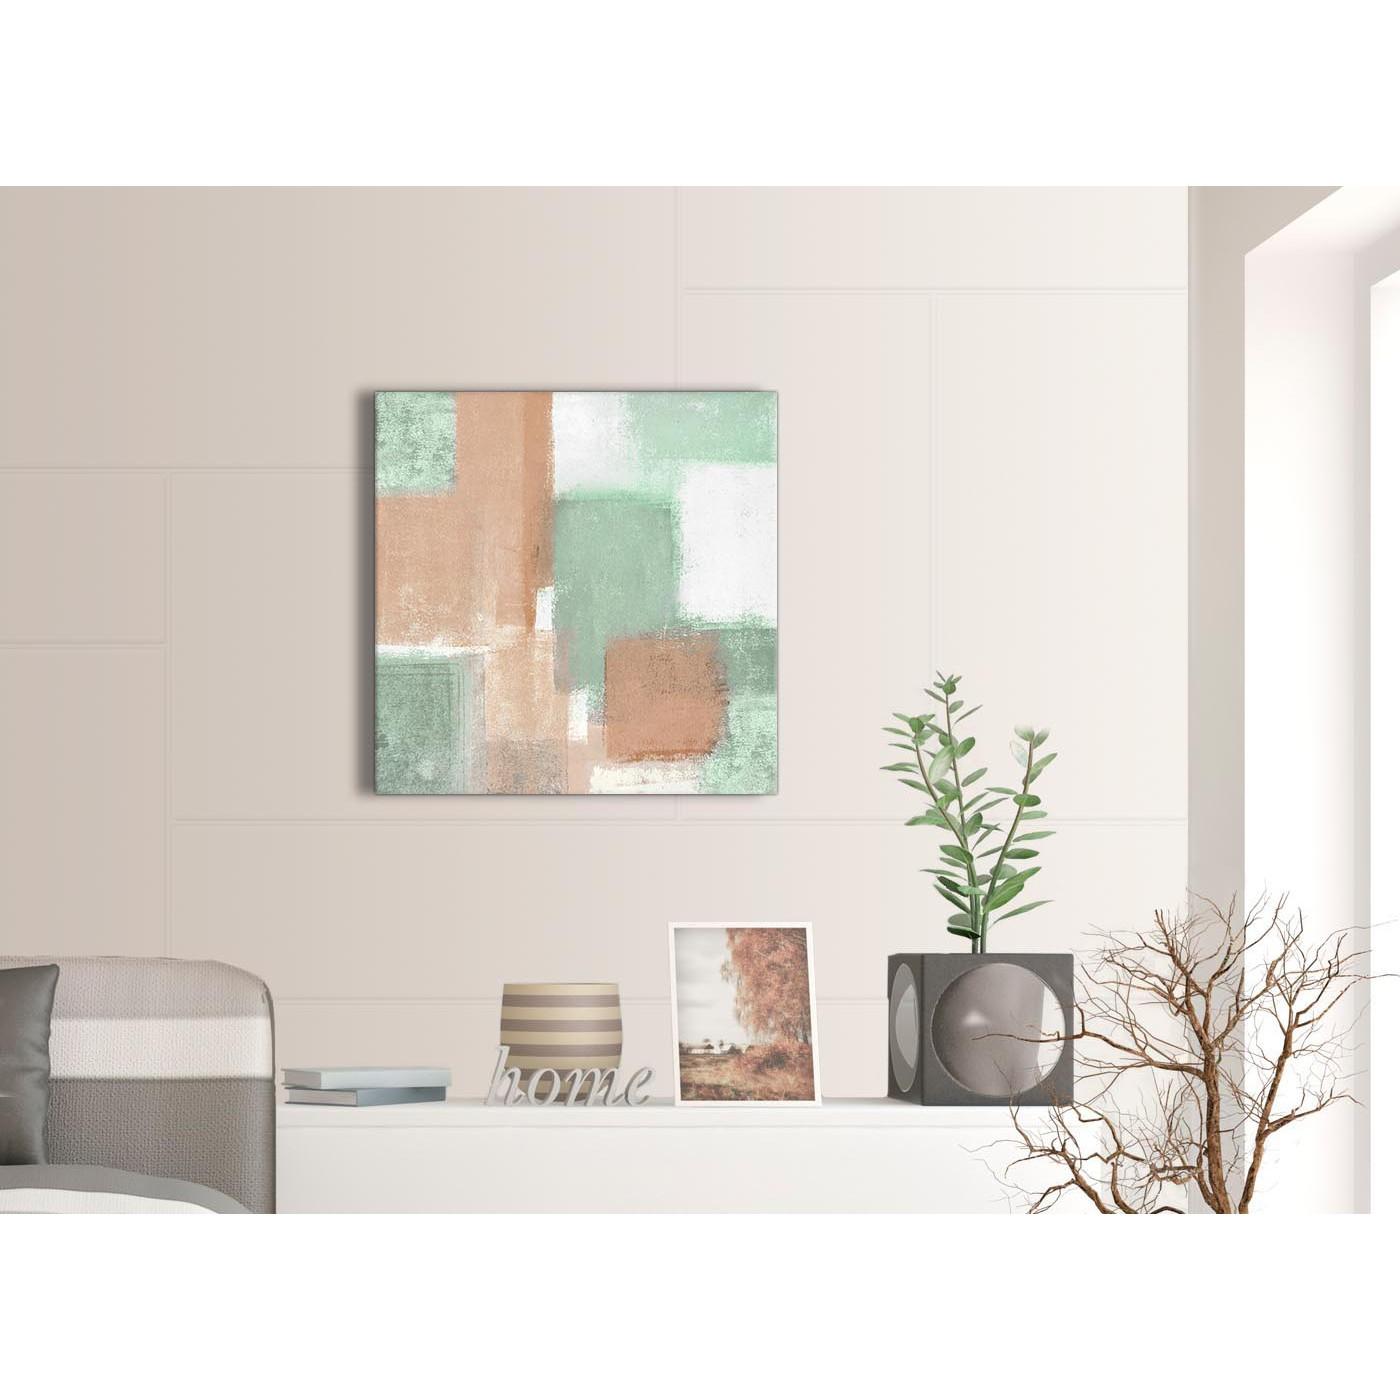 Peach Mint Green Living Room Canvas Wall Art Decor - Abstract 1s375m ...